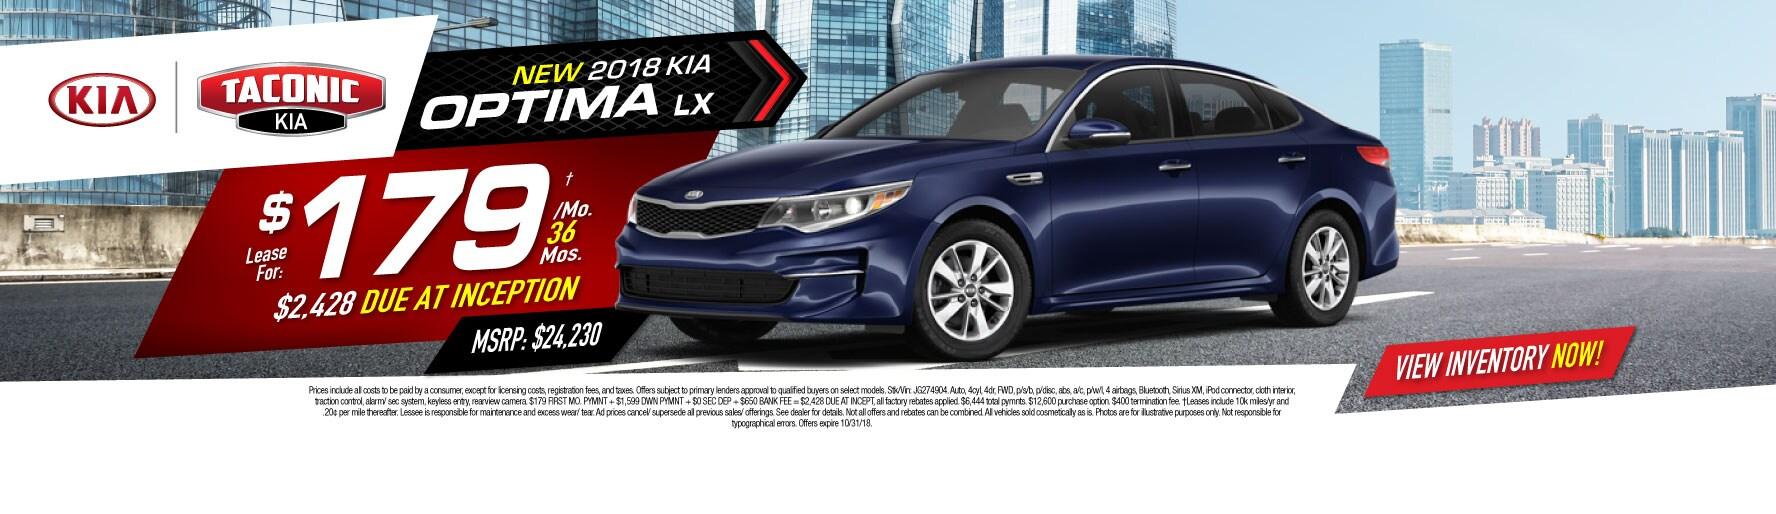 New 2018 Kia Optima LX Lease For: $179u2020/MO 36 MOS., MSRP: $24,230, $2,428  DUE AT INCEPT